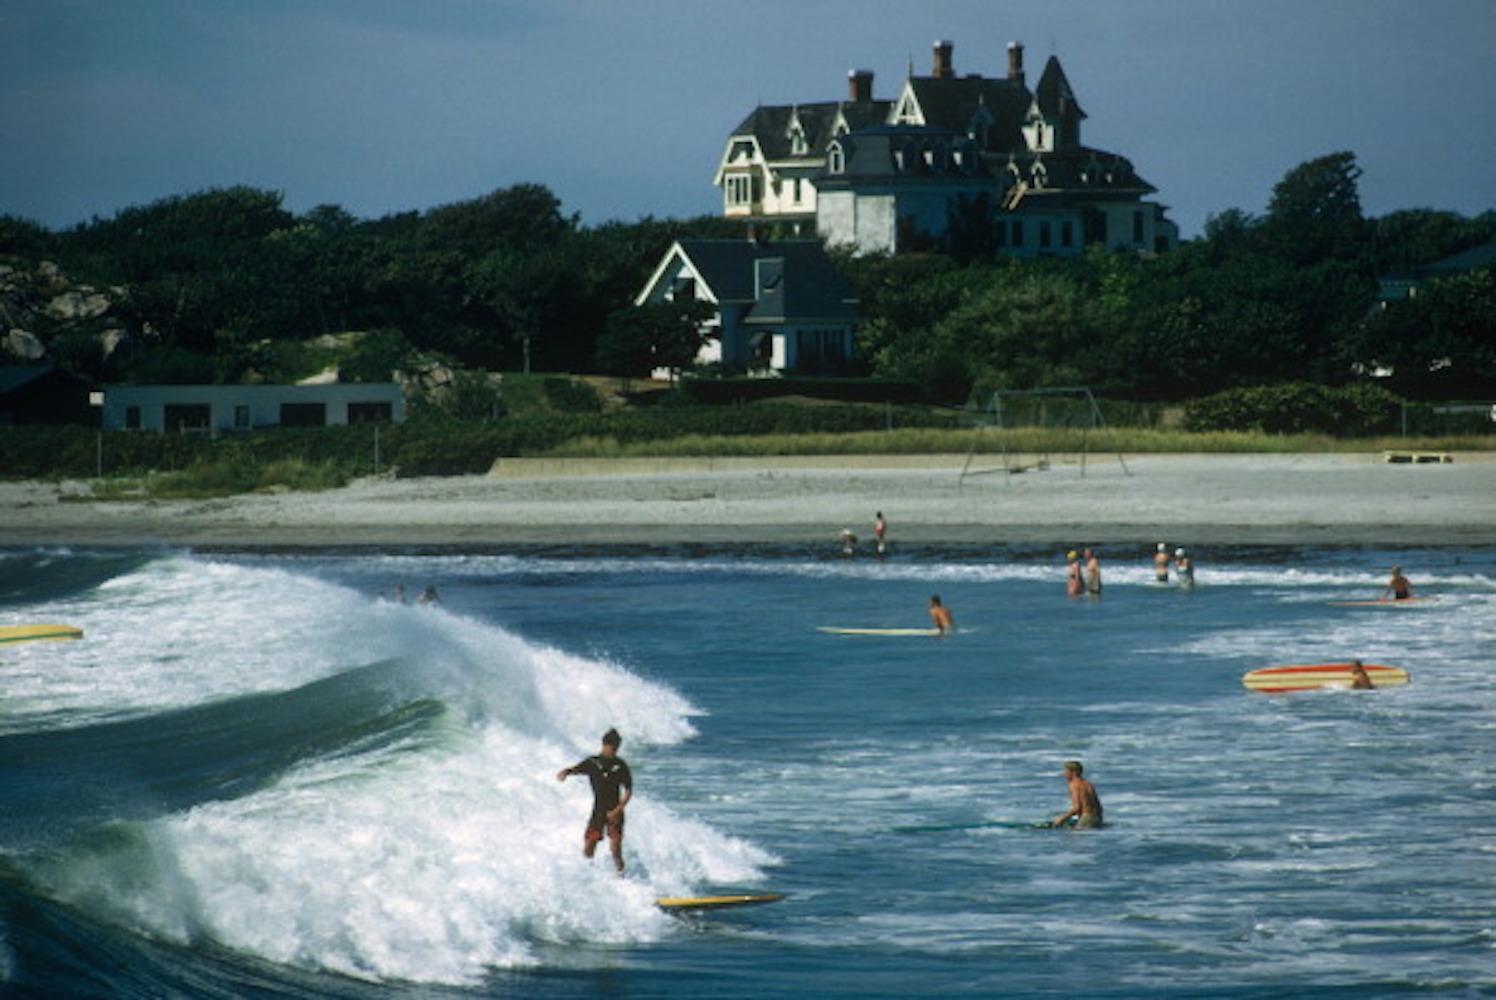 Rhode Island Surfers, 1965 - Slim Aarons, 20th Century, Watersport photography